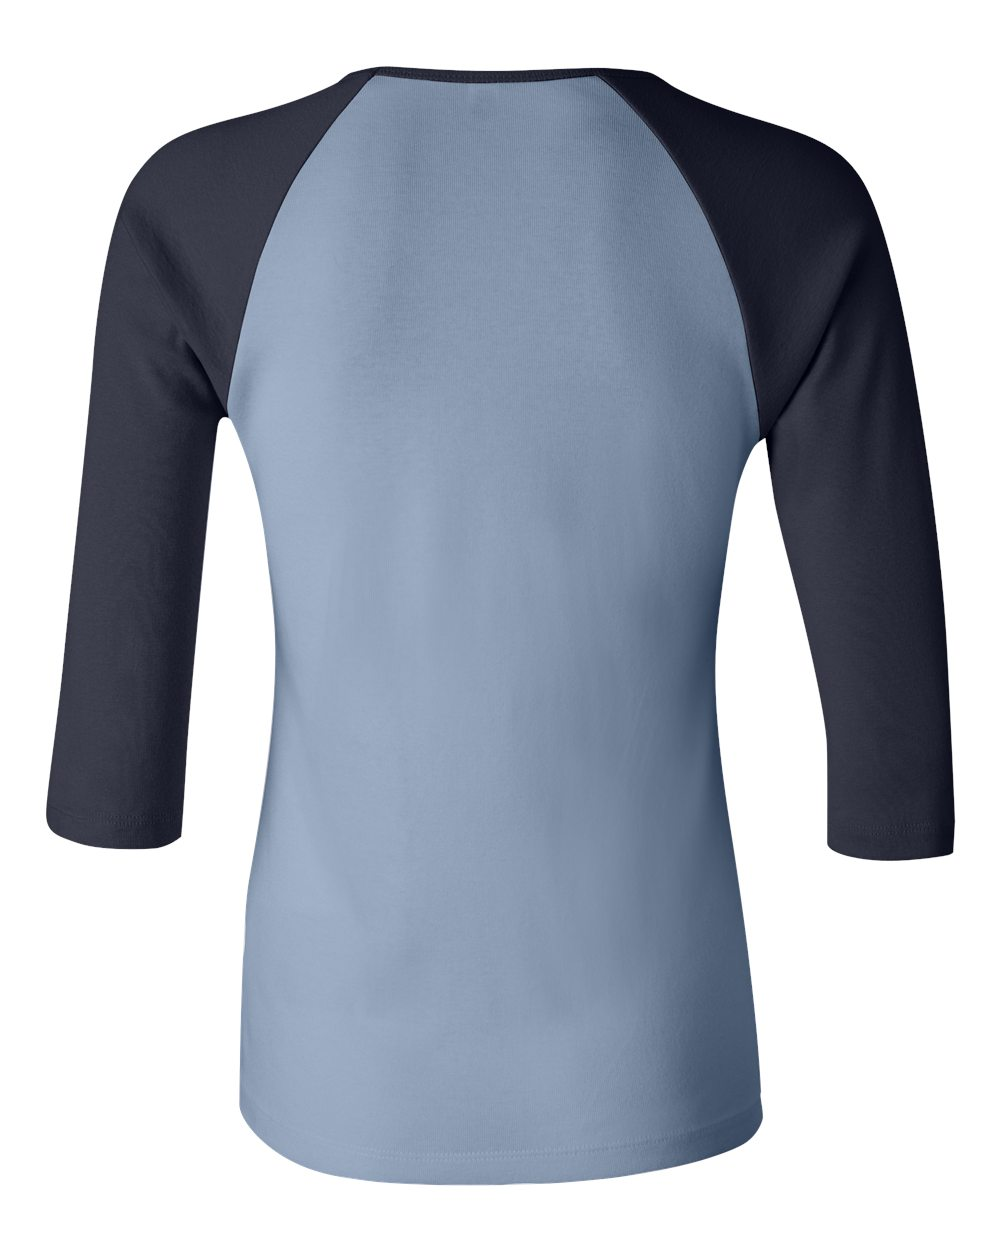 Bella-Canvas-Womens-Stretch-Rib-3-4-Sleeve-Contrast-Raglan-T-Shirt-B2000 thumbnail 5